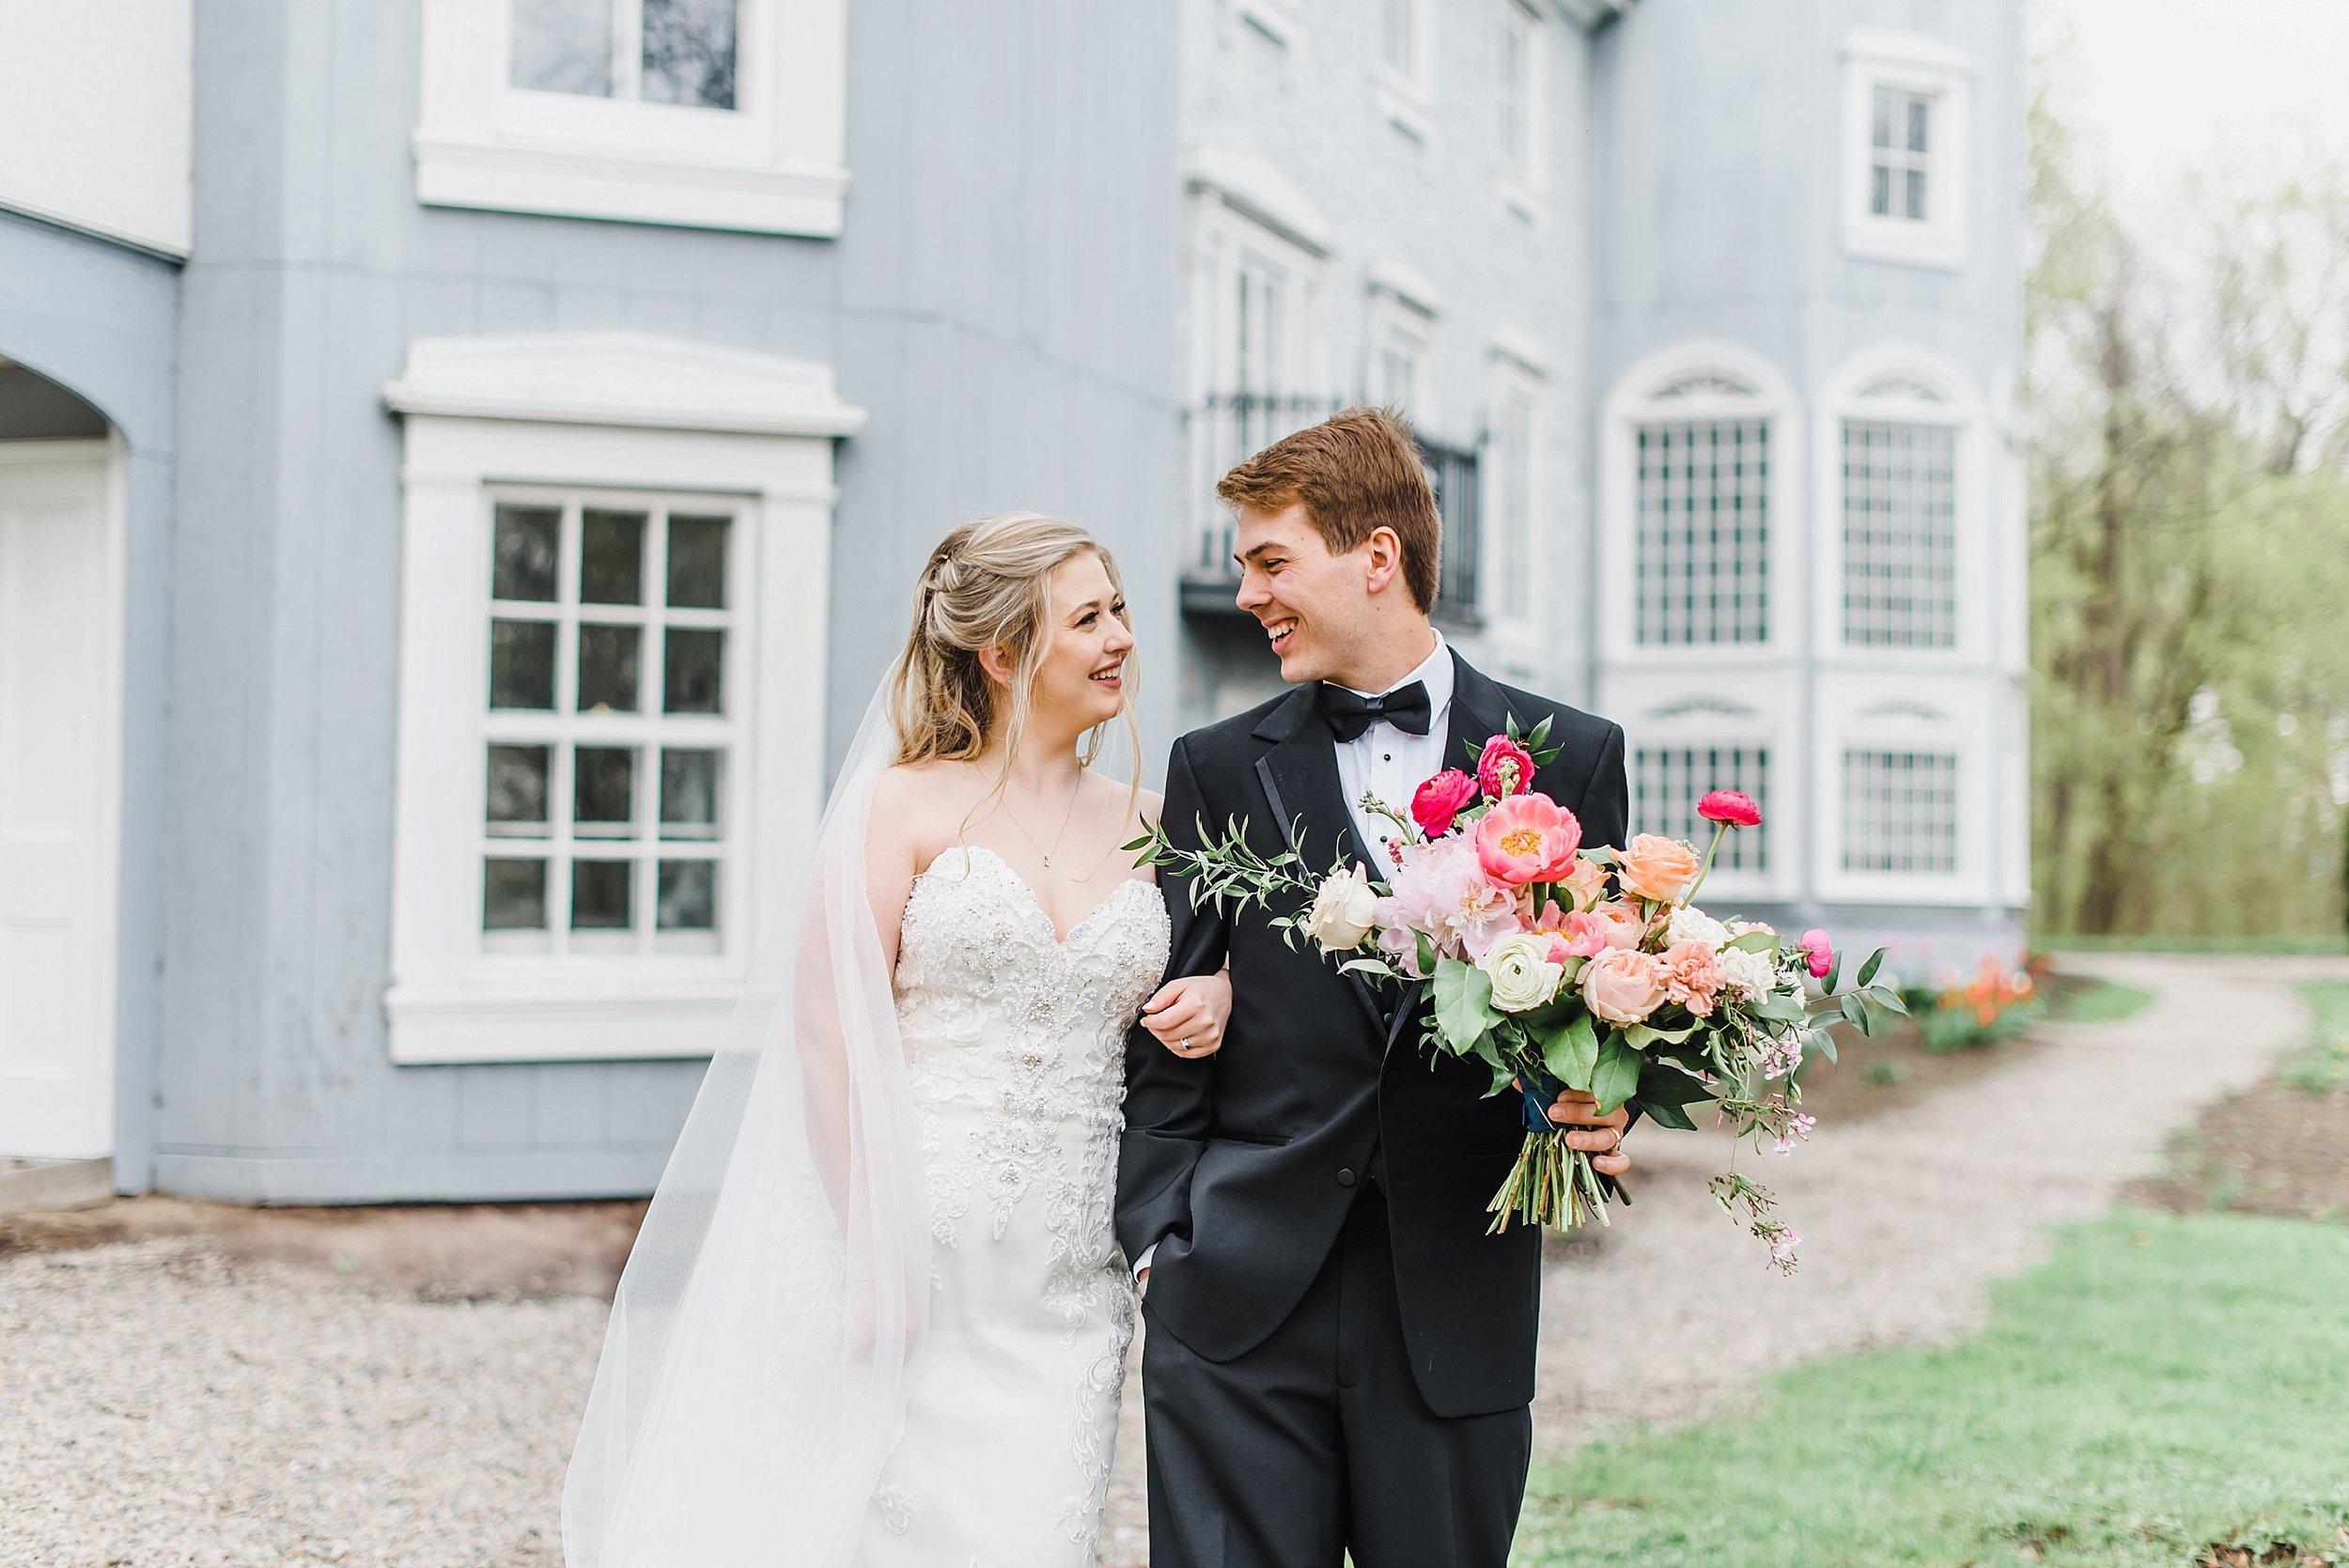 light airy indie fine art ottawa wedding photographer | Ali and Batoul Photography_0188.jpg